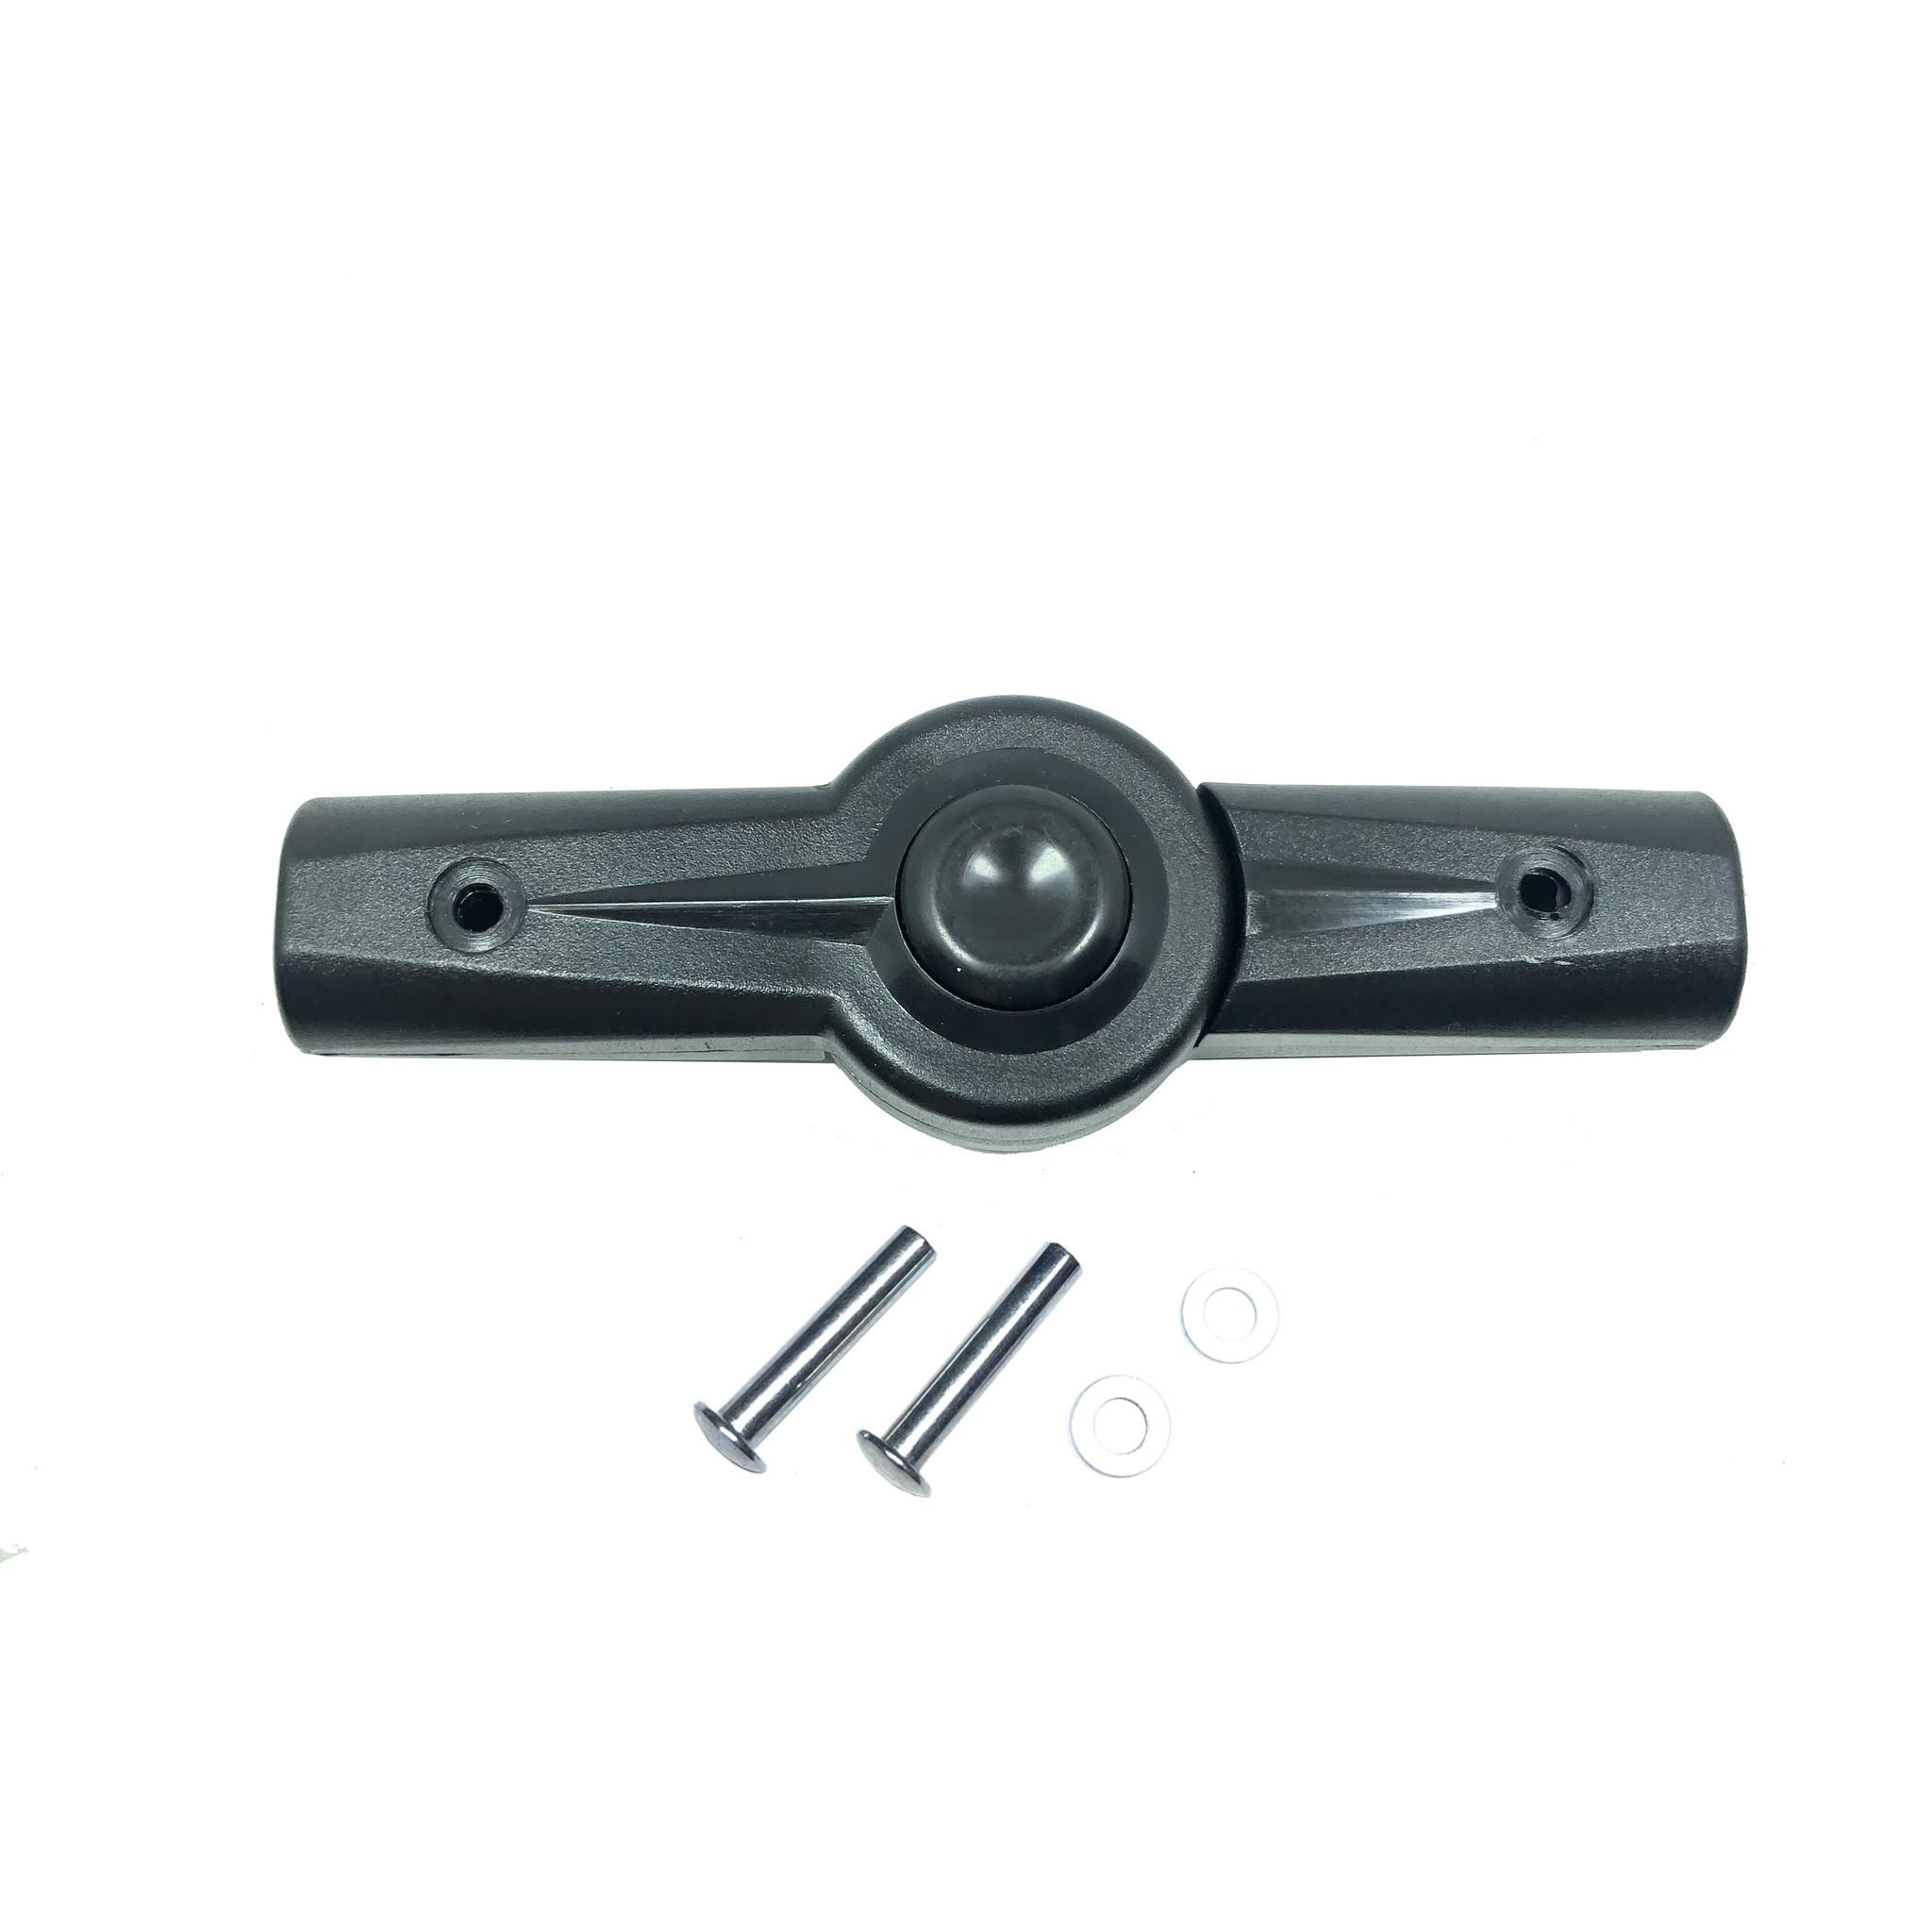 Запчасти для колясок Camarelo Регулятор ручки круг / круг 20 мм. или 22 мм. кругкруг.jpg